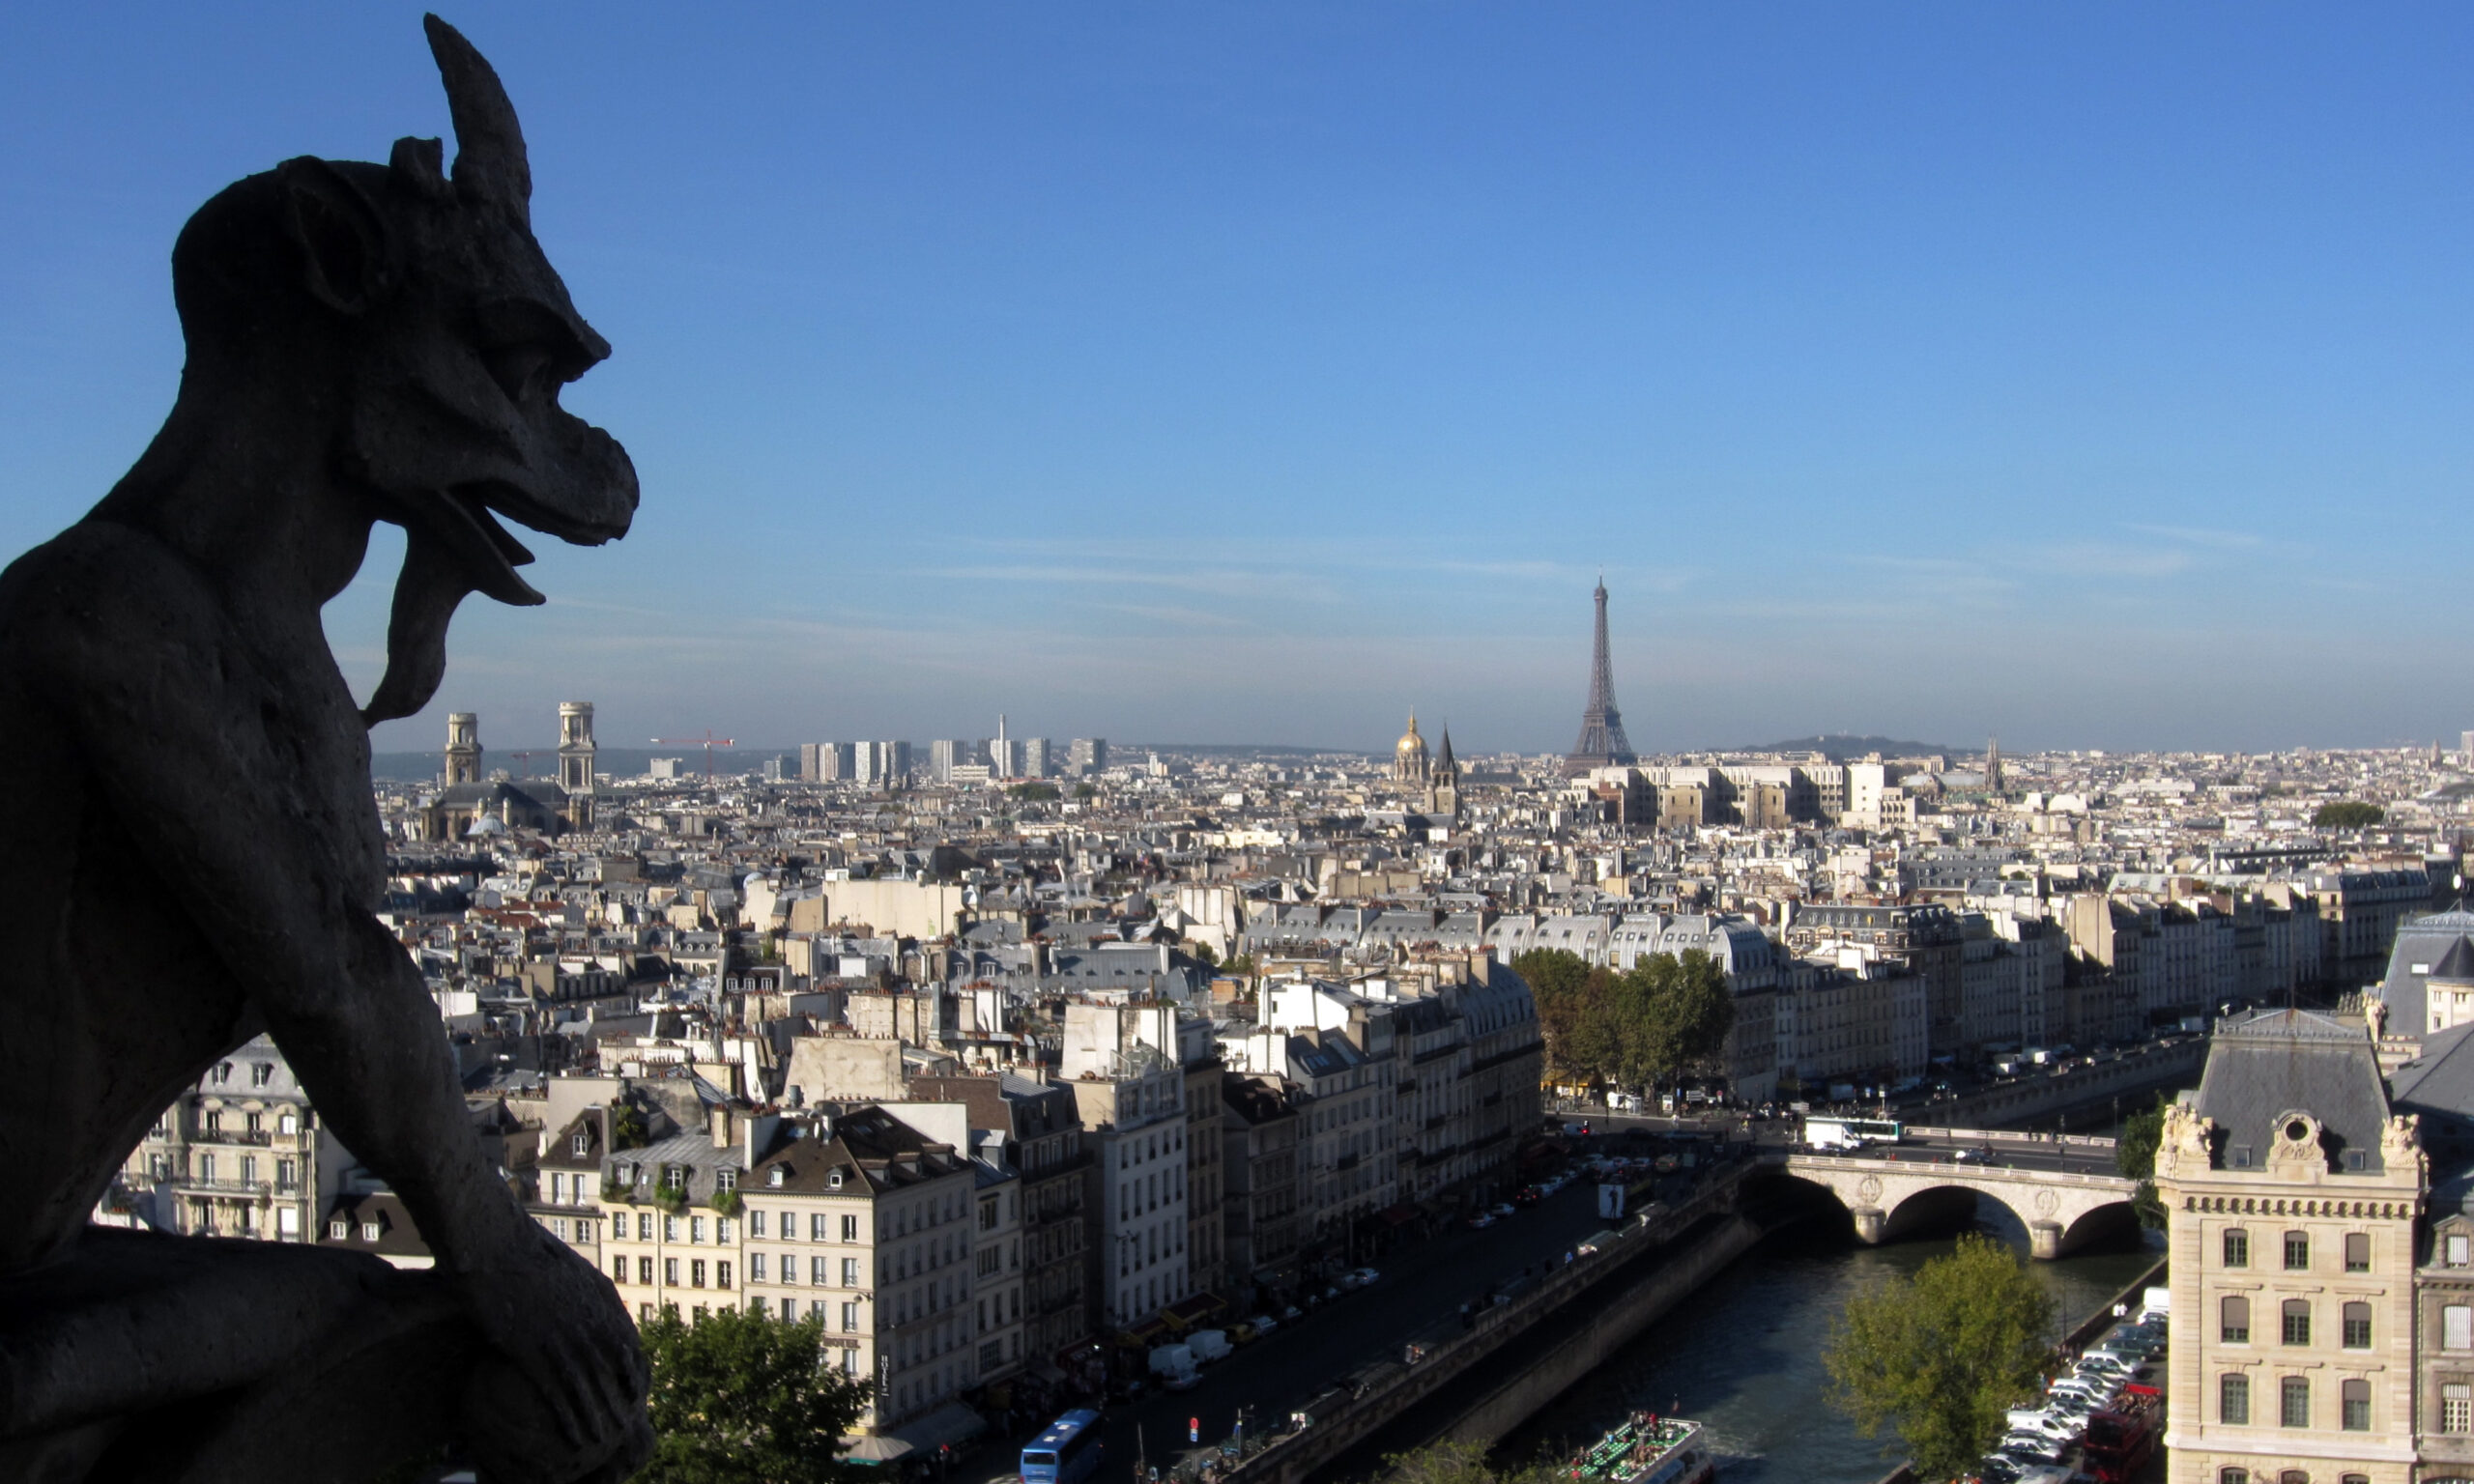 Gargoyle looking over Paris.